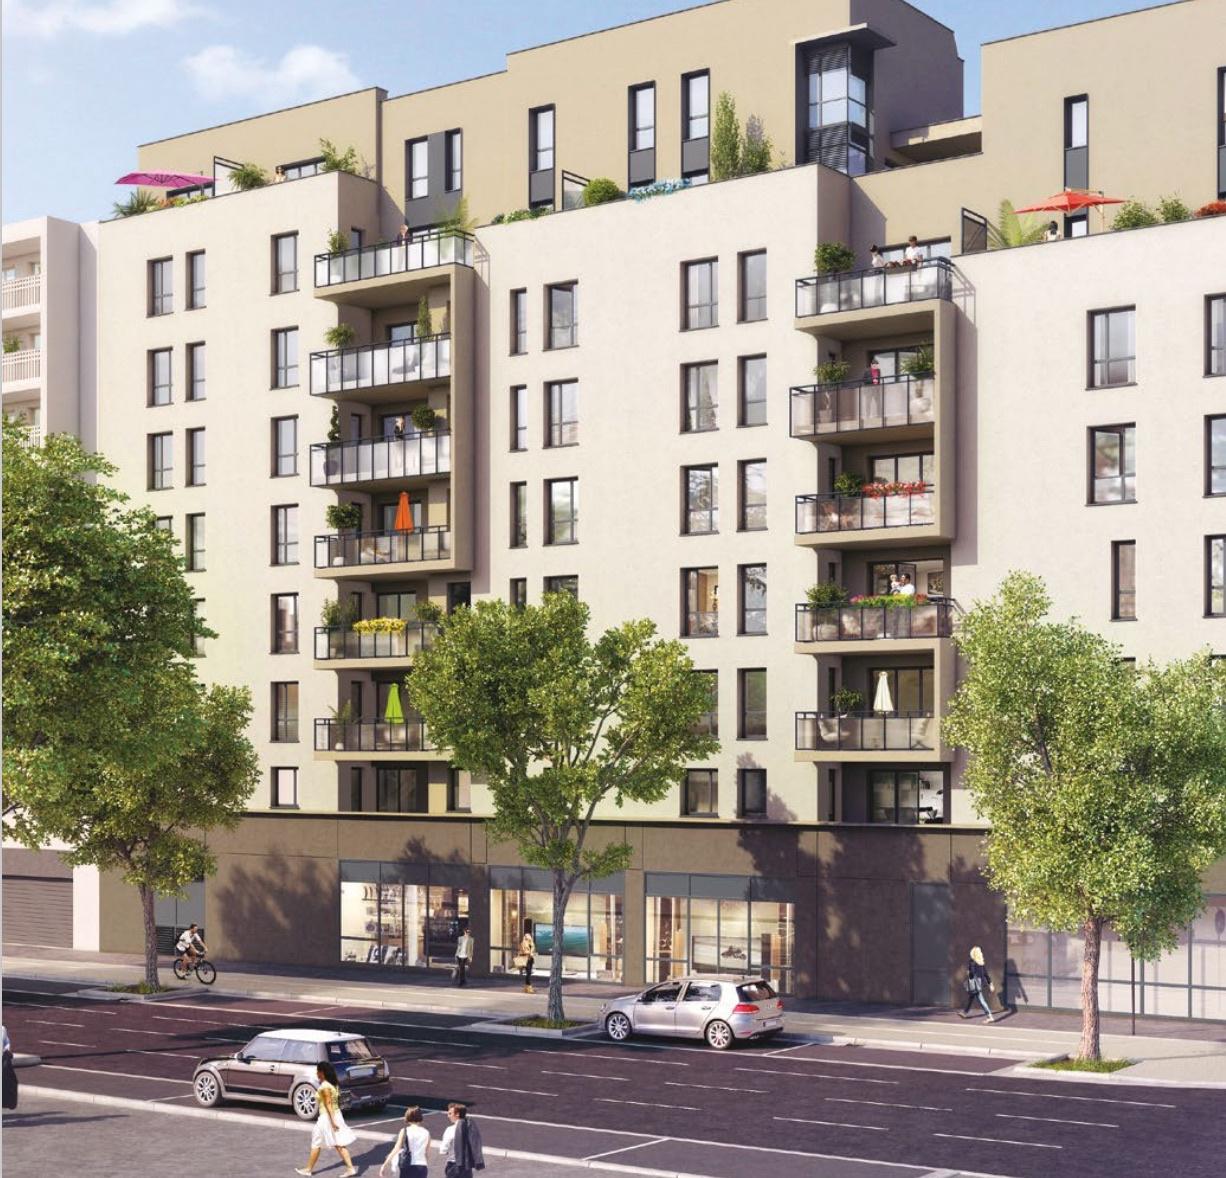 Vente Immobilier Professionnel Local commercial Lyon (69007)